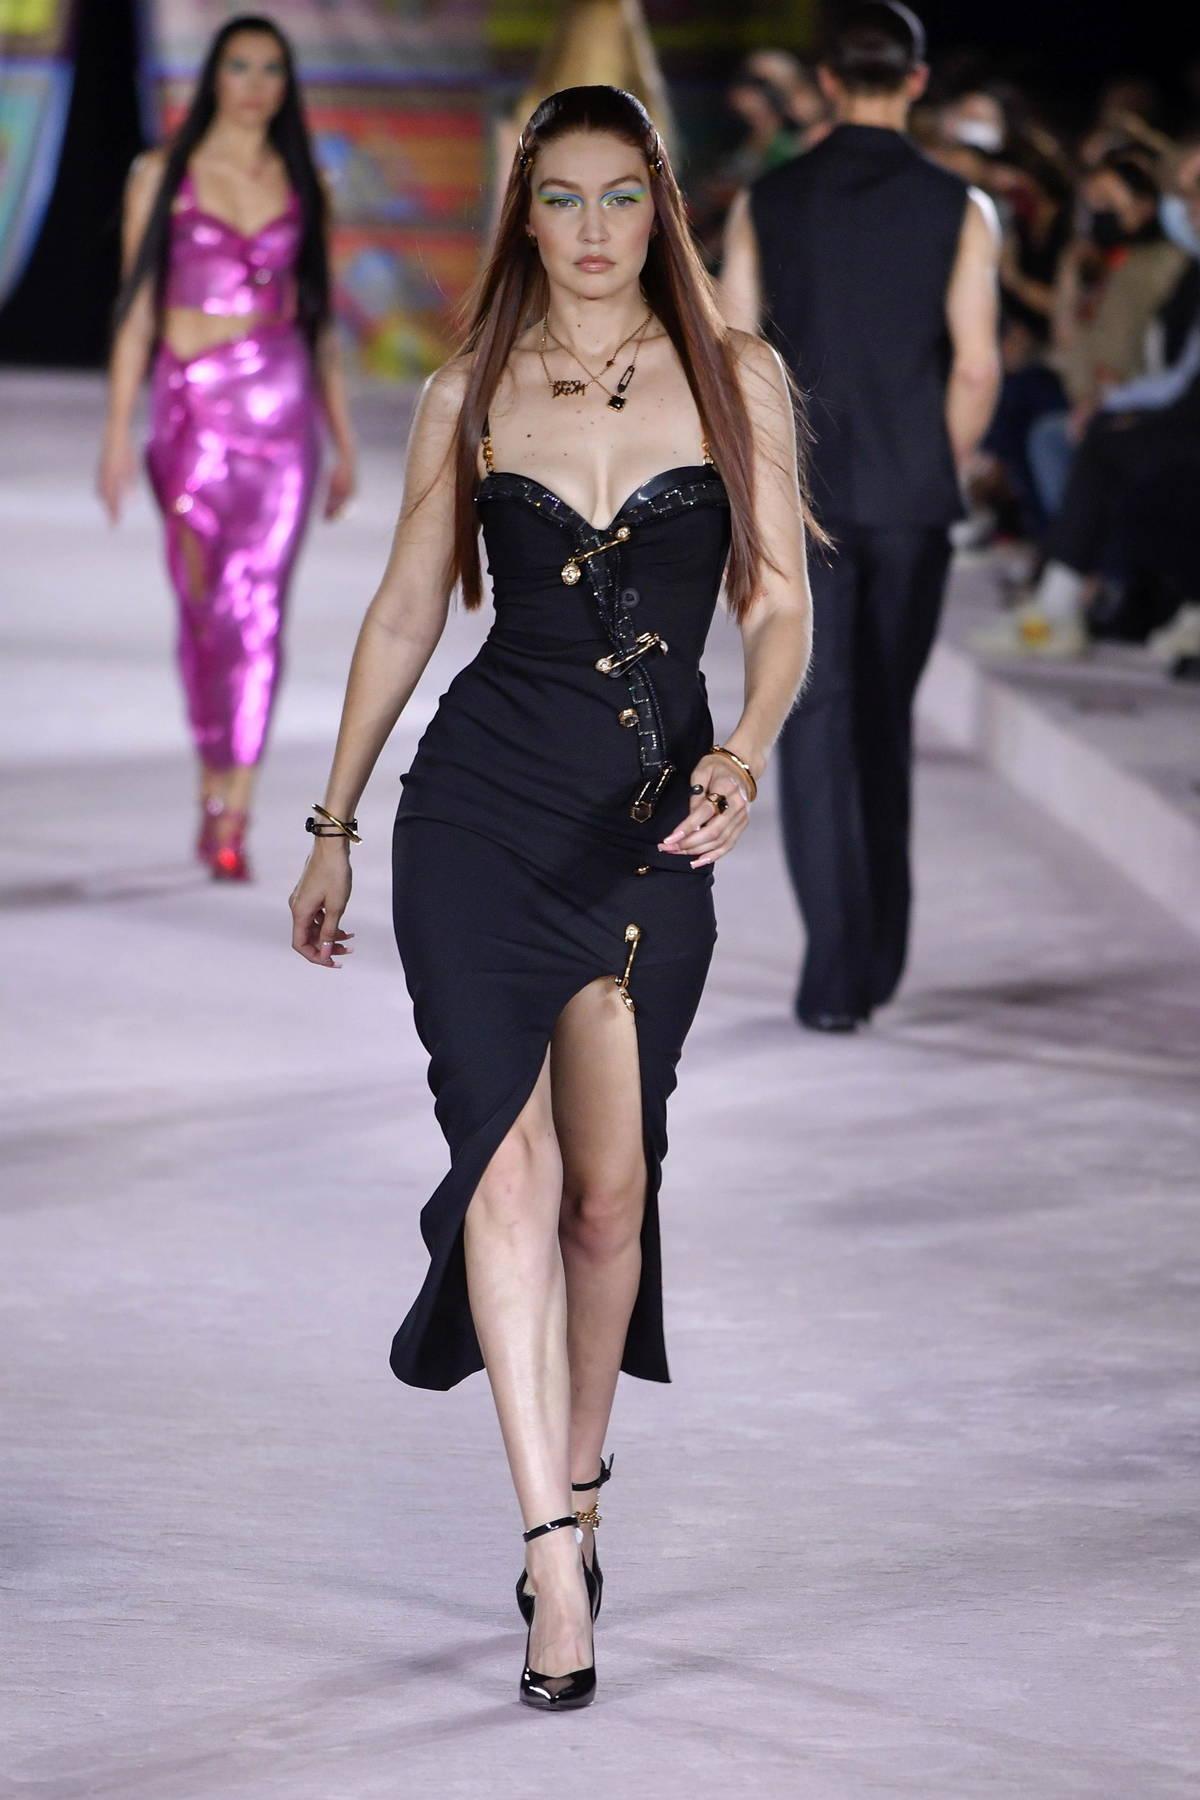 Gigi Hadid walks the runway for The Versace SS22 fashion show during Milan Fashion Week in Milan, Italy